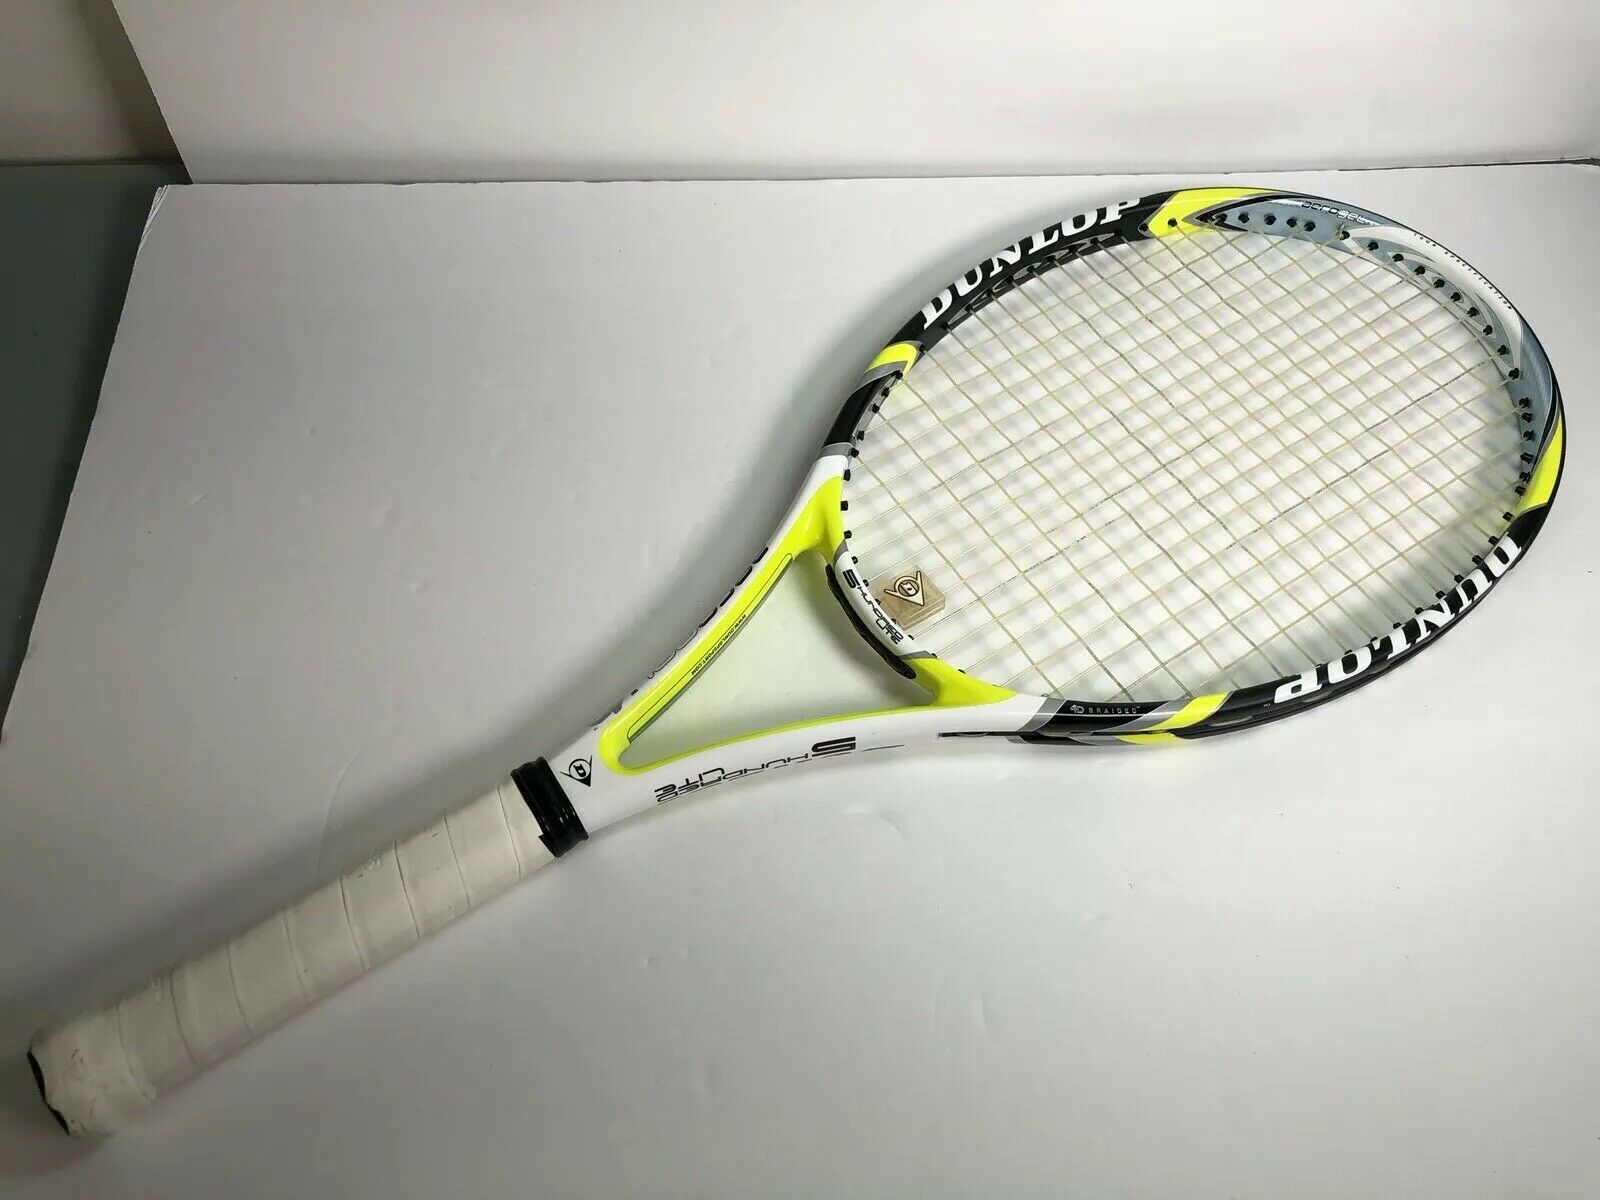 Dunlop Aerogel 4D 500 Lite 100 cabeza 4 1 4 Tenis Raqueta Bolsa de patrón de agarre 16x18